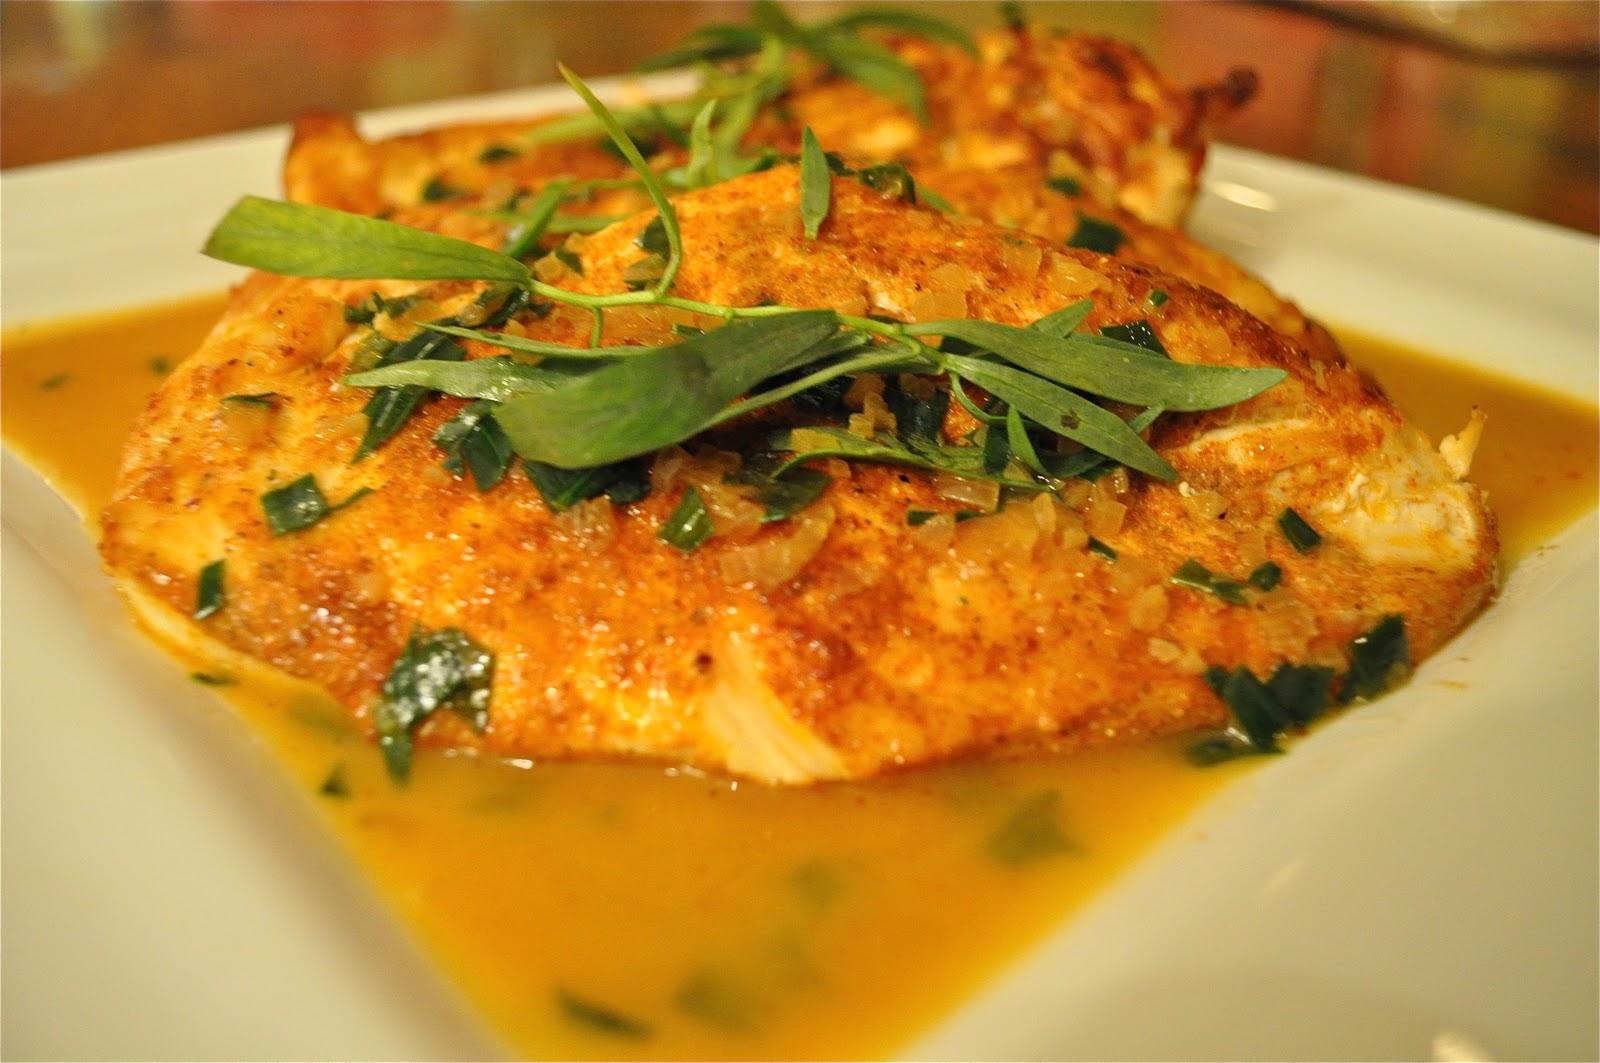 Chicken Breasts With Tarragon Recipes — Dishmaps